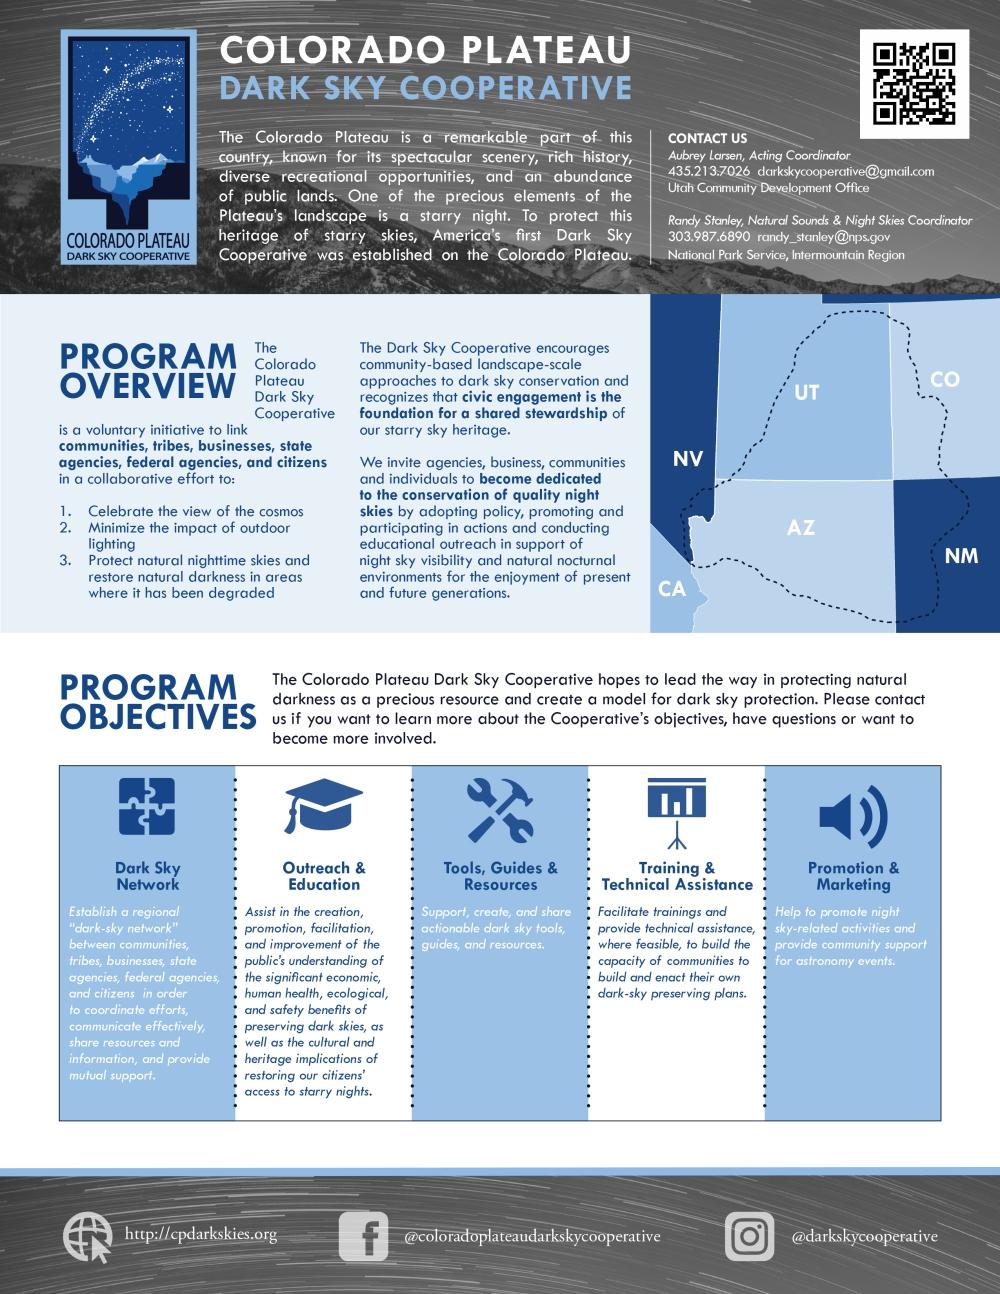 new cpdsc informational flyer colorado plateau dark sky cooperative